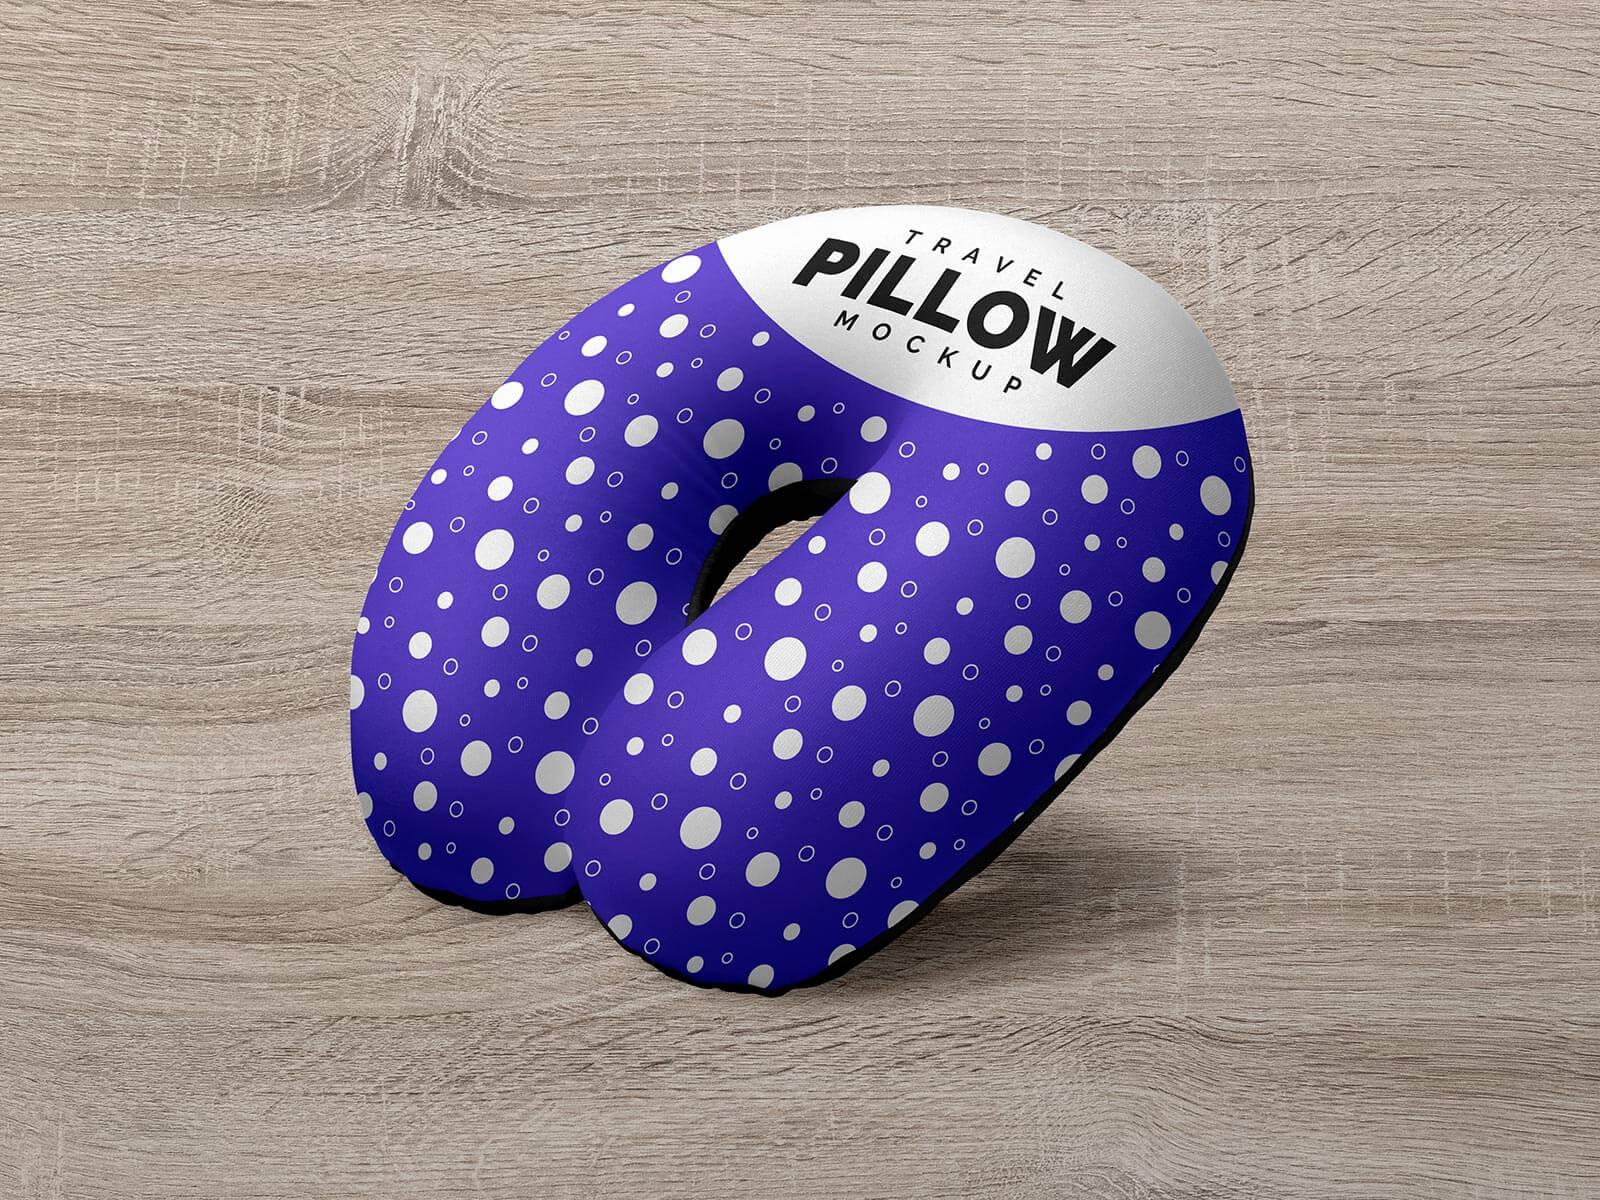 Free Travel Neck Pillow Mockup PSD Set (2)